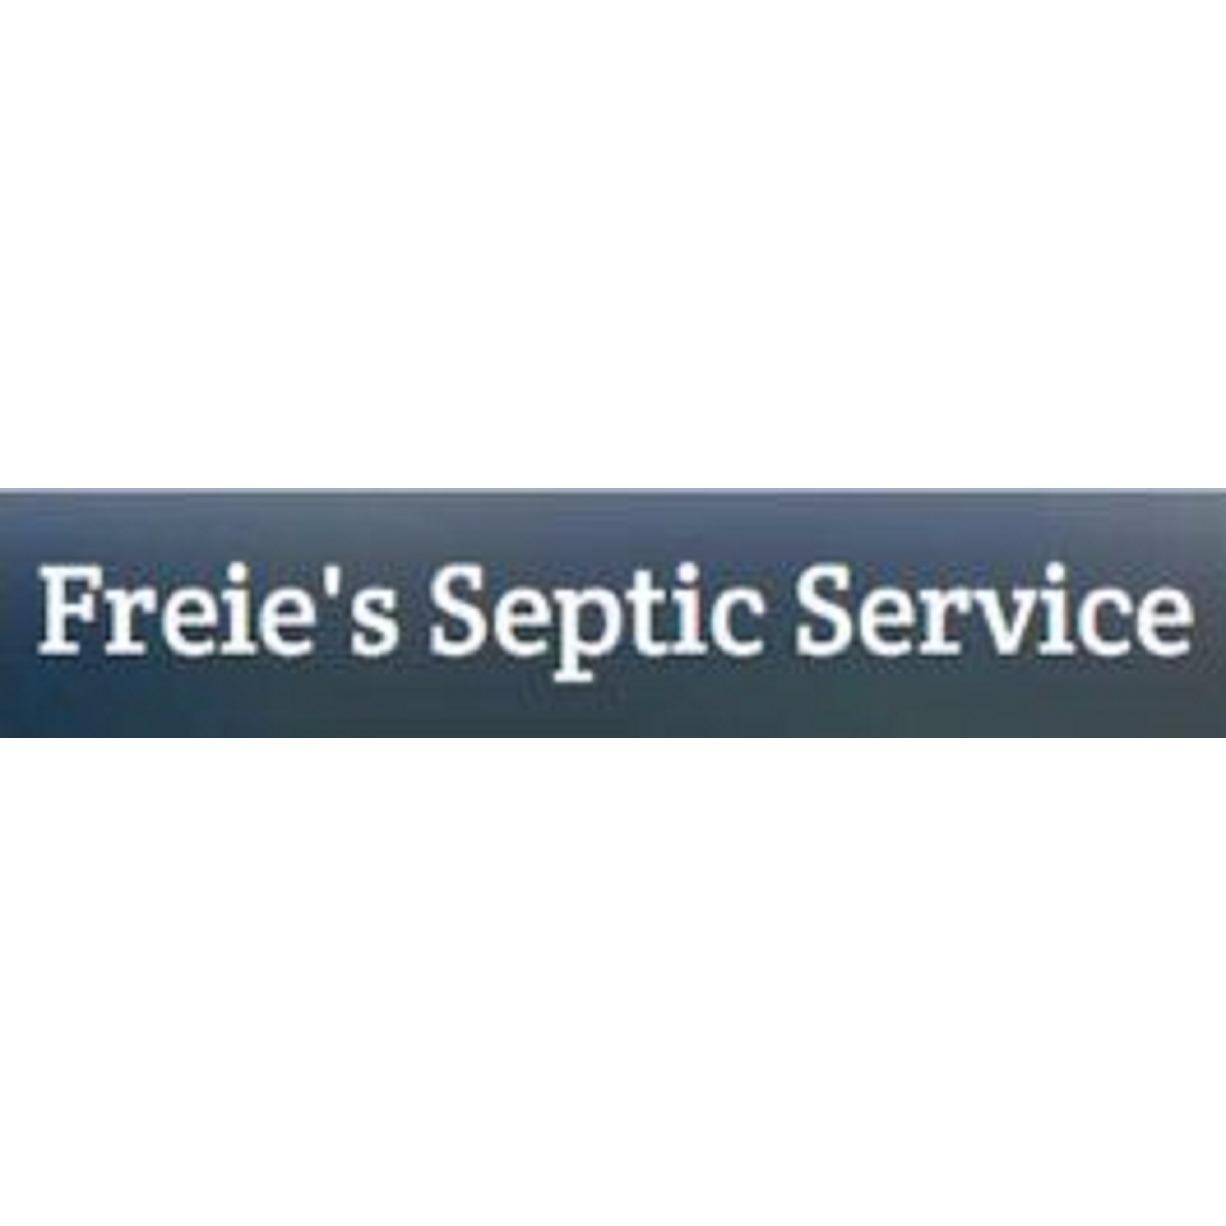 Freie's Septic Service